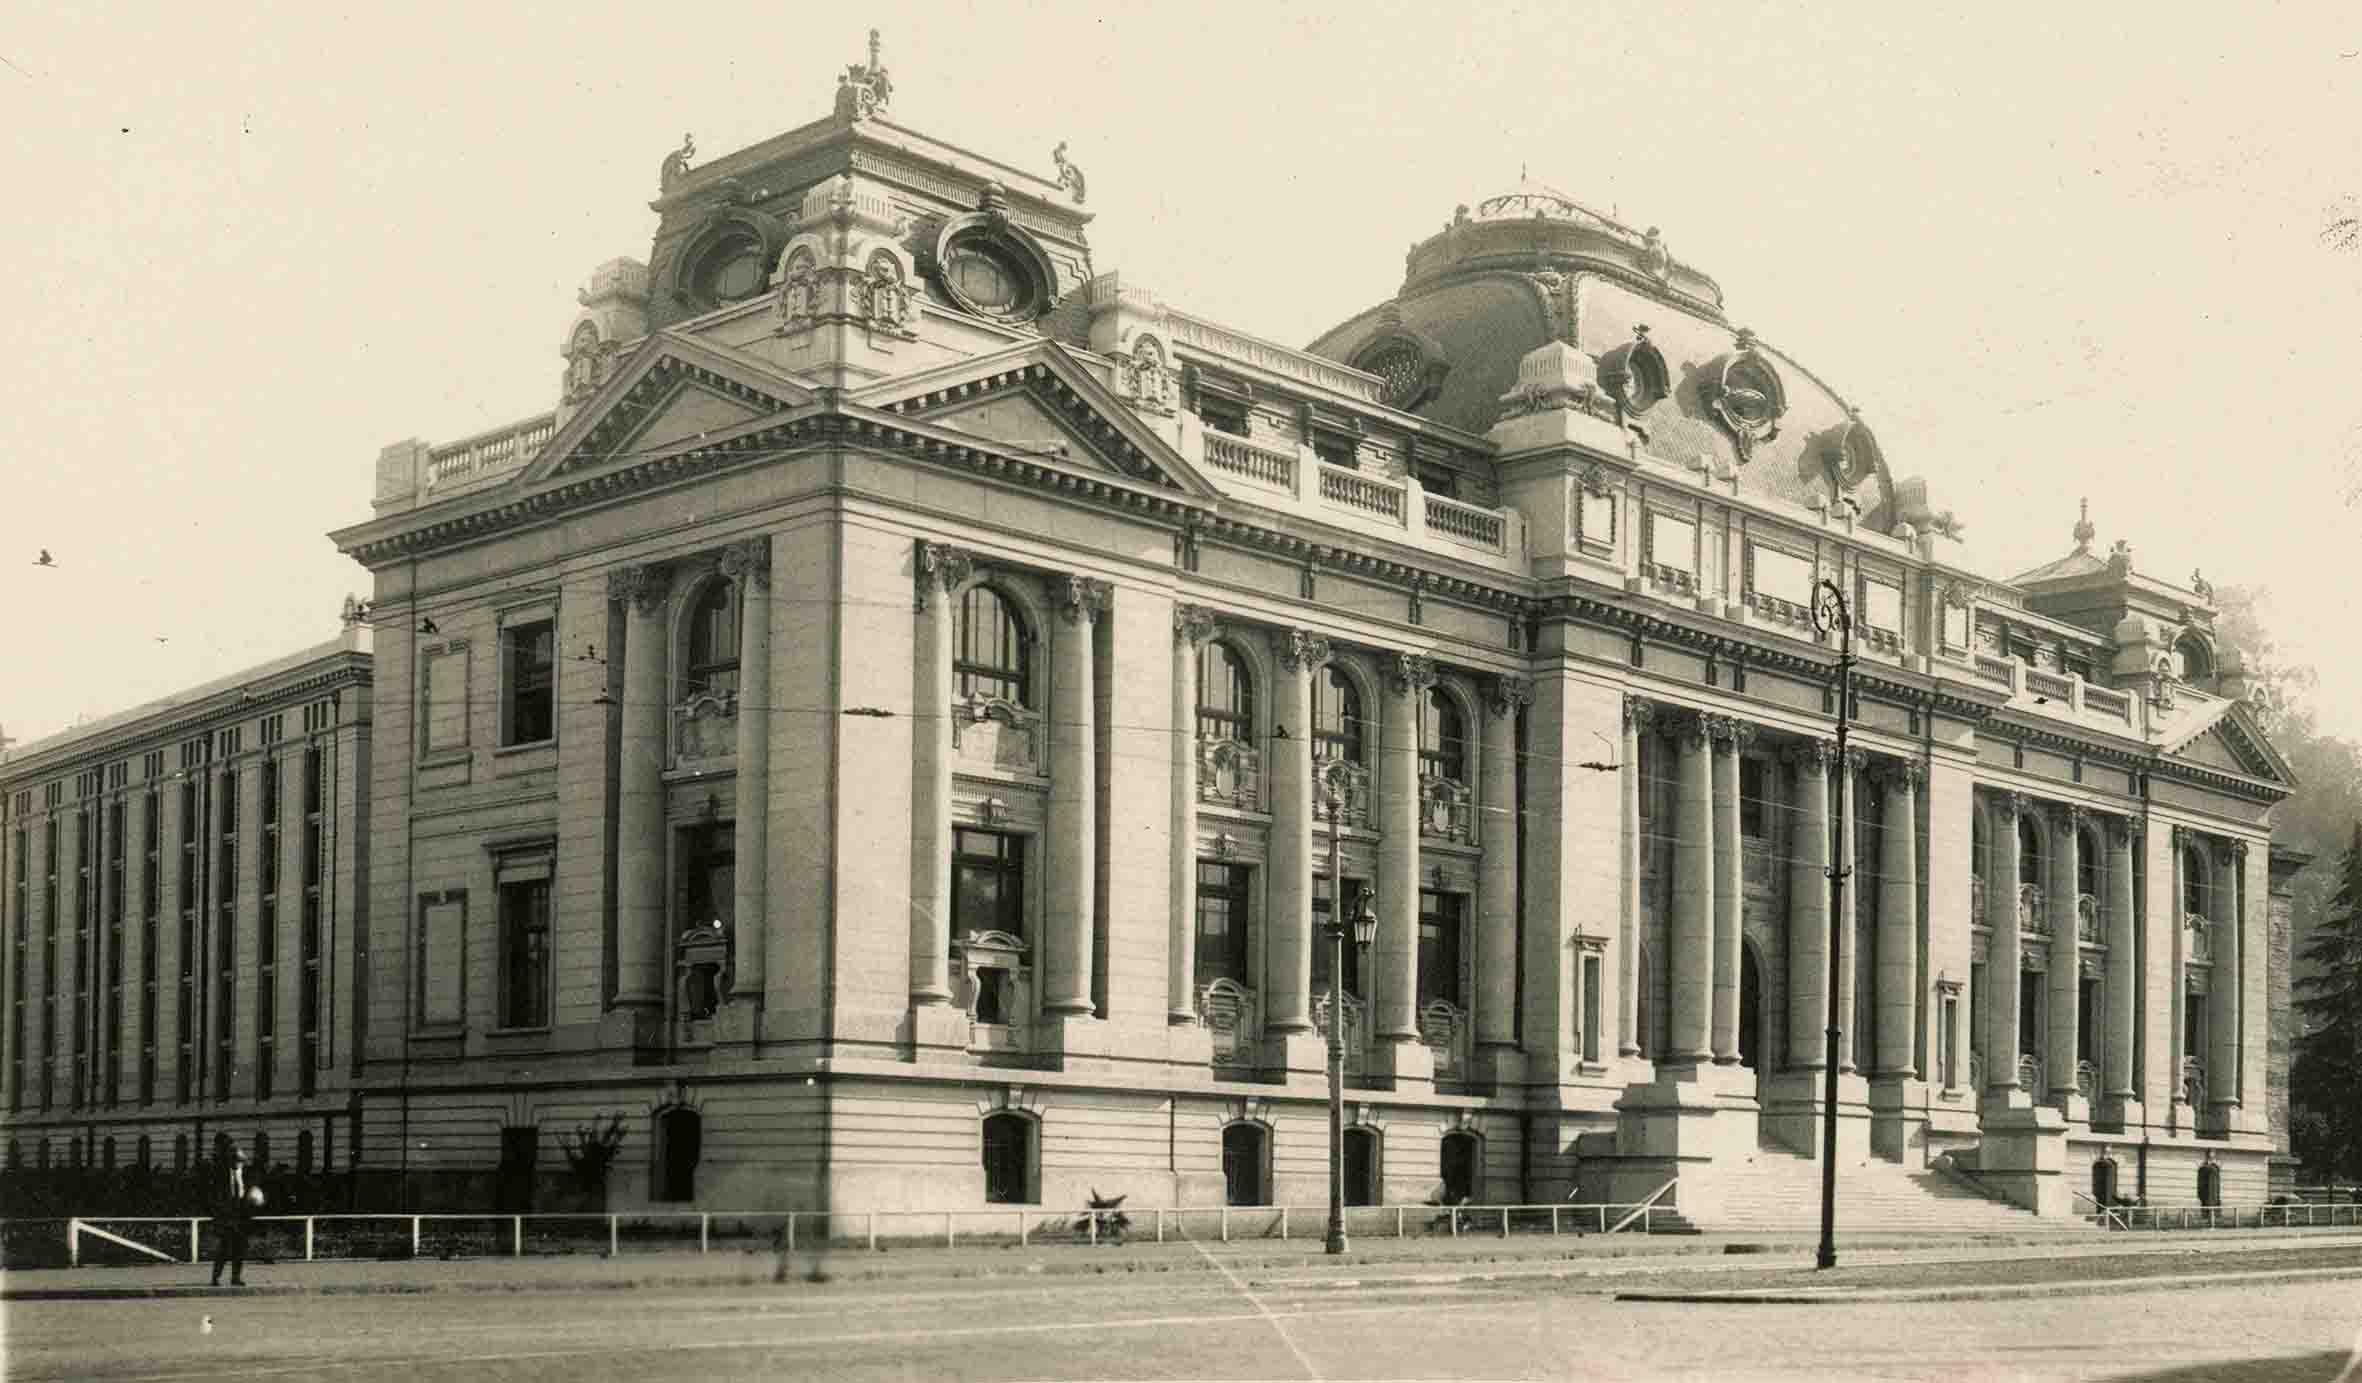 Enterreno - Fotos históricas de chile - fotos antiguas de Chile - Biblioteca Nacional ca. 1920